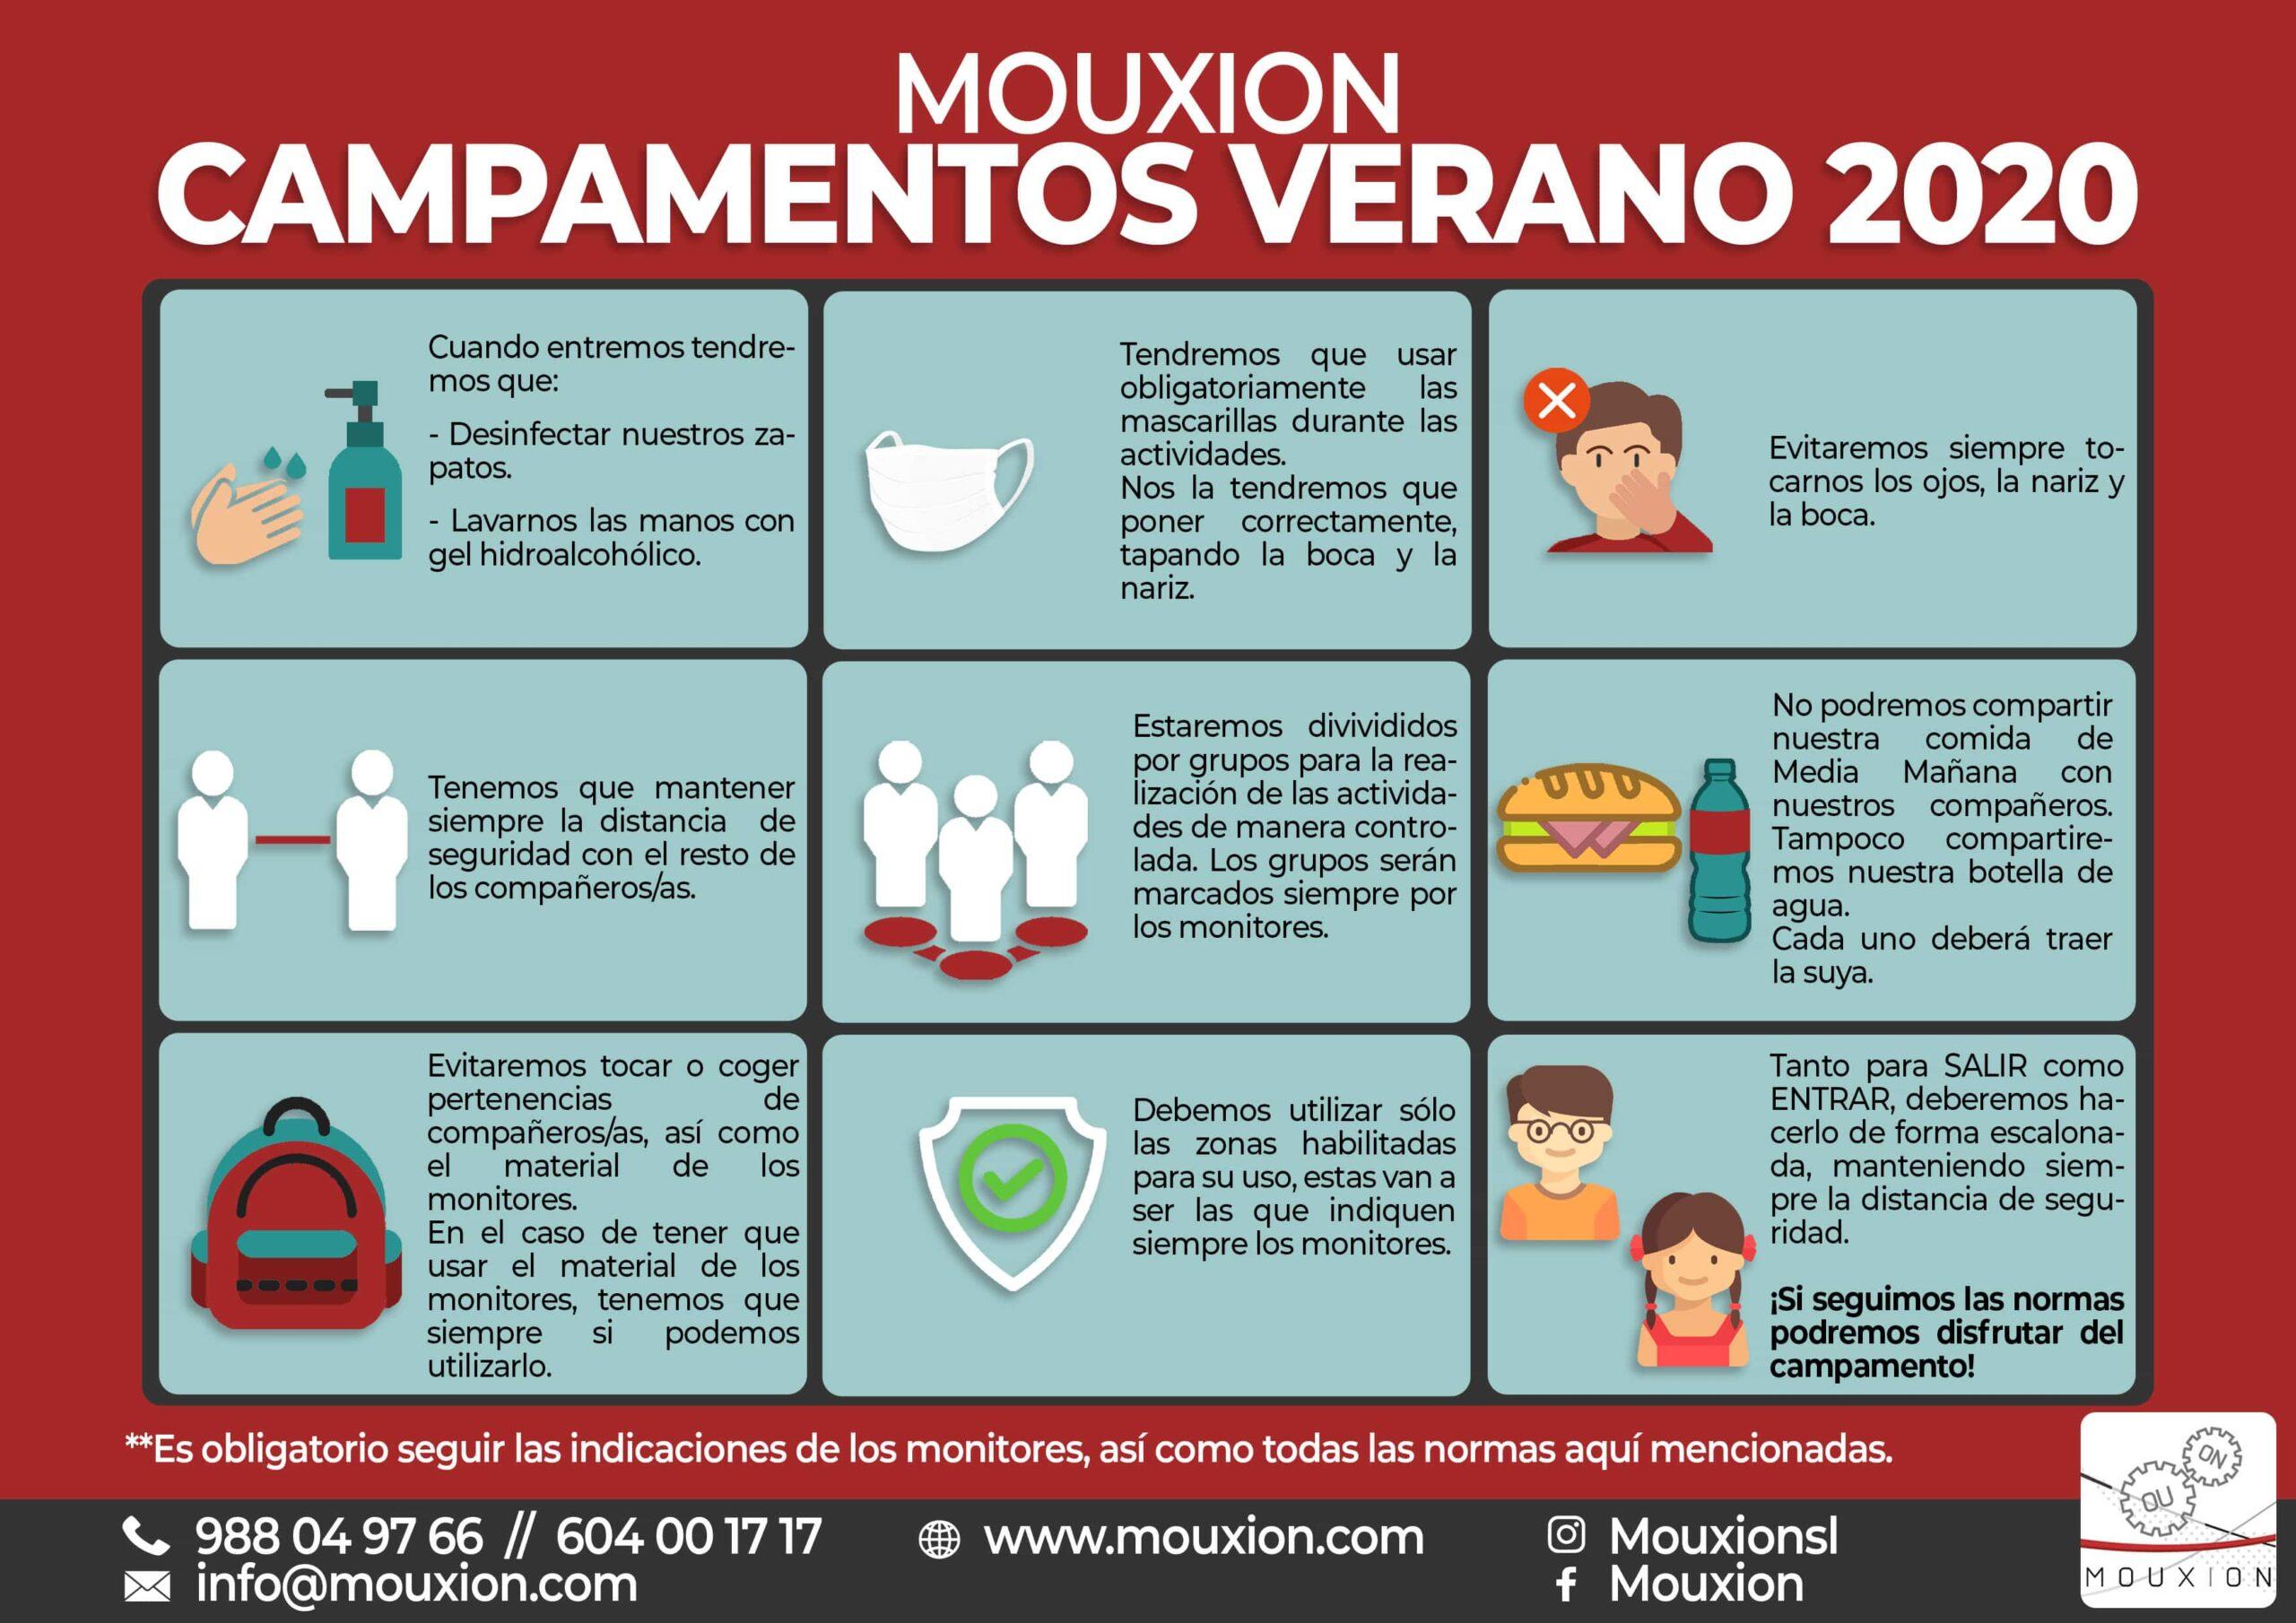 Campamentos Ourense Verano 2020